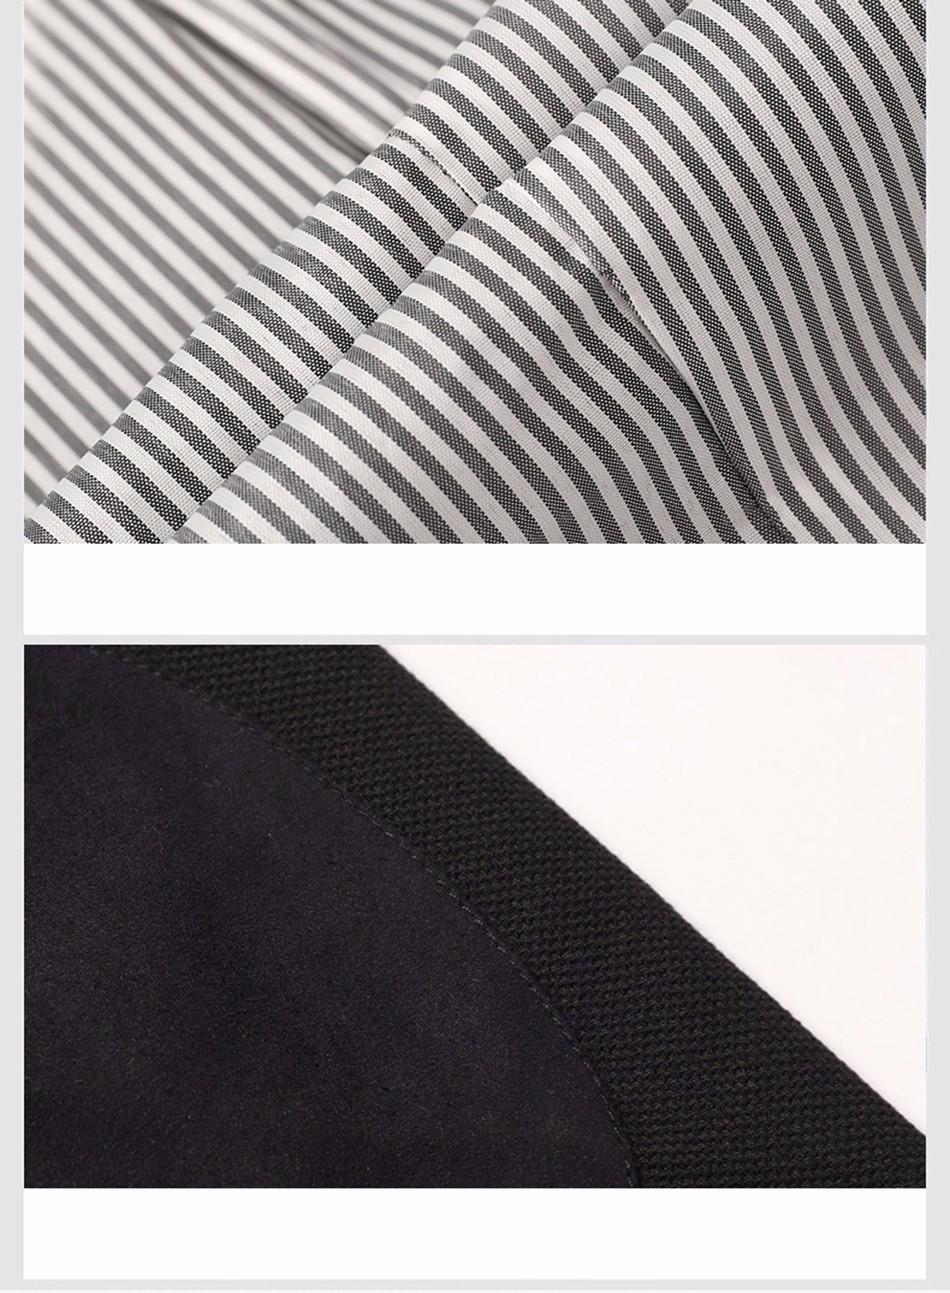 HTB1zbejOVXXXXckXVXXq6xXFXXX0 - Men Casual Warm Coats Size M-3XL Good Quality Single Breasted Design Thicken Men's Fashion Wool Clothings Lapel Design hsd-J316